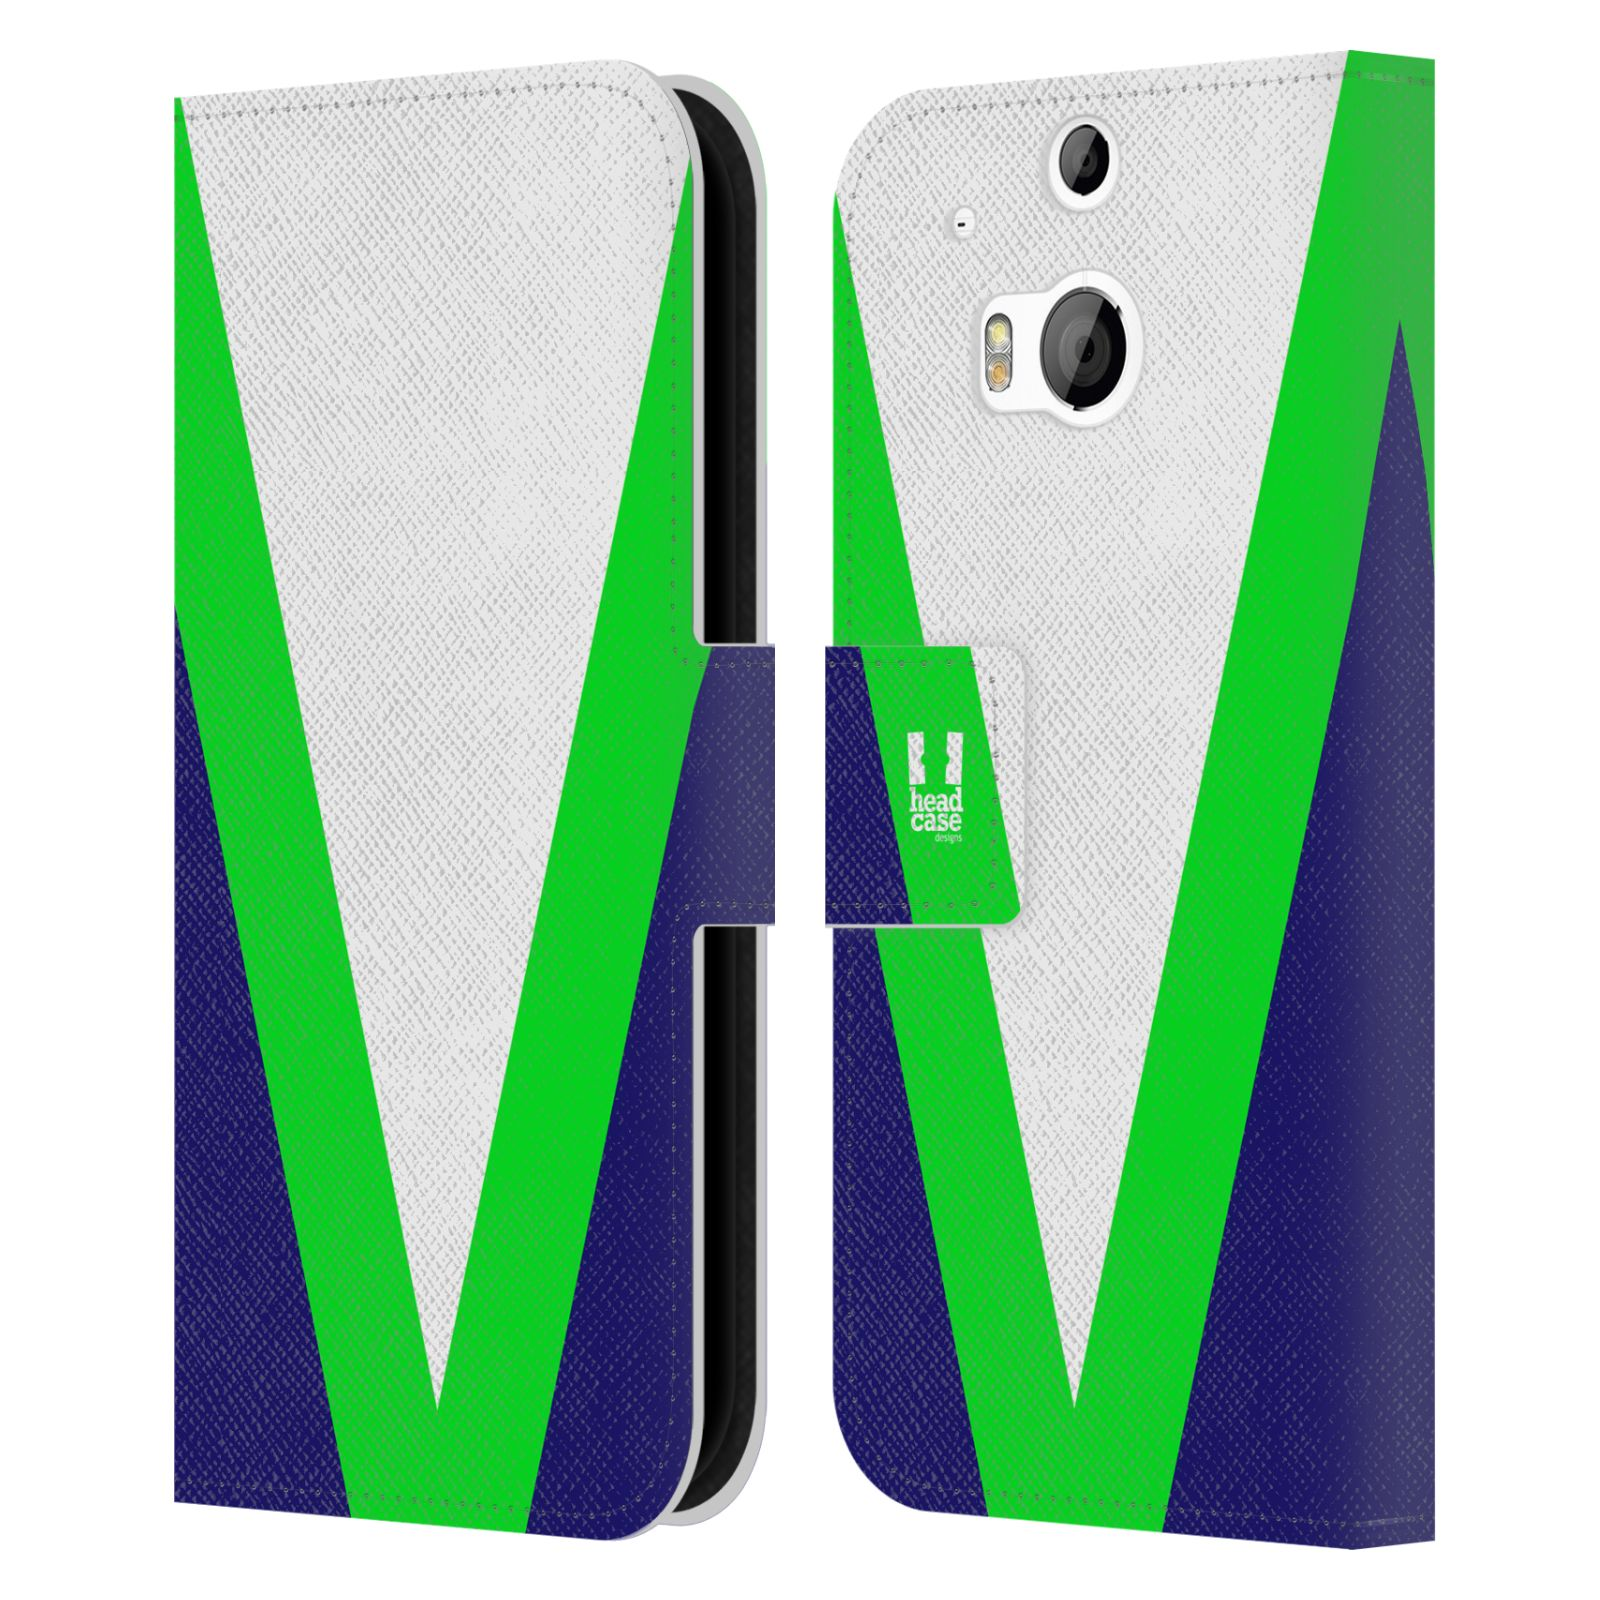 HEAD CASE Flipové pouzdro pro mobil HTC ONE M8/M8s barevné tvary zelená a modrá